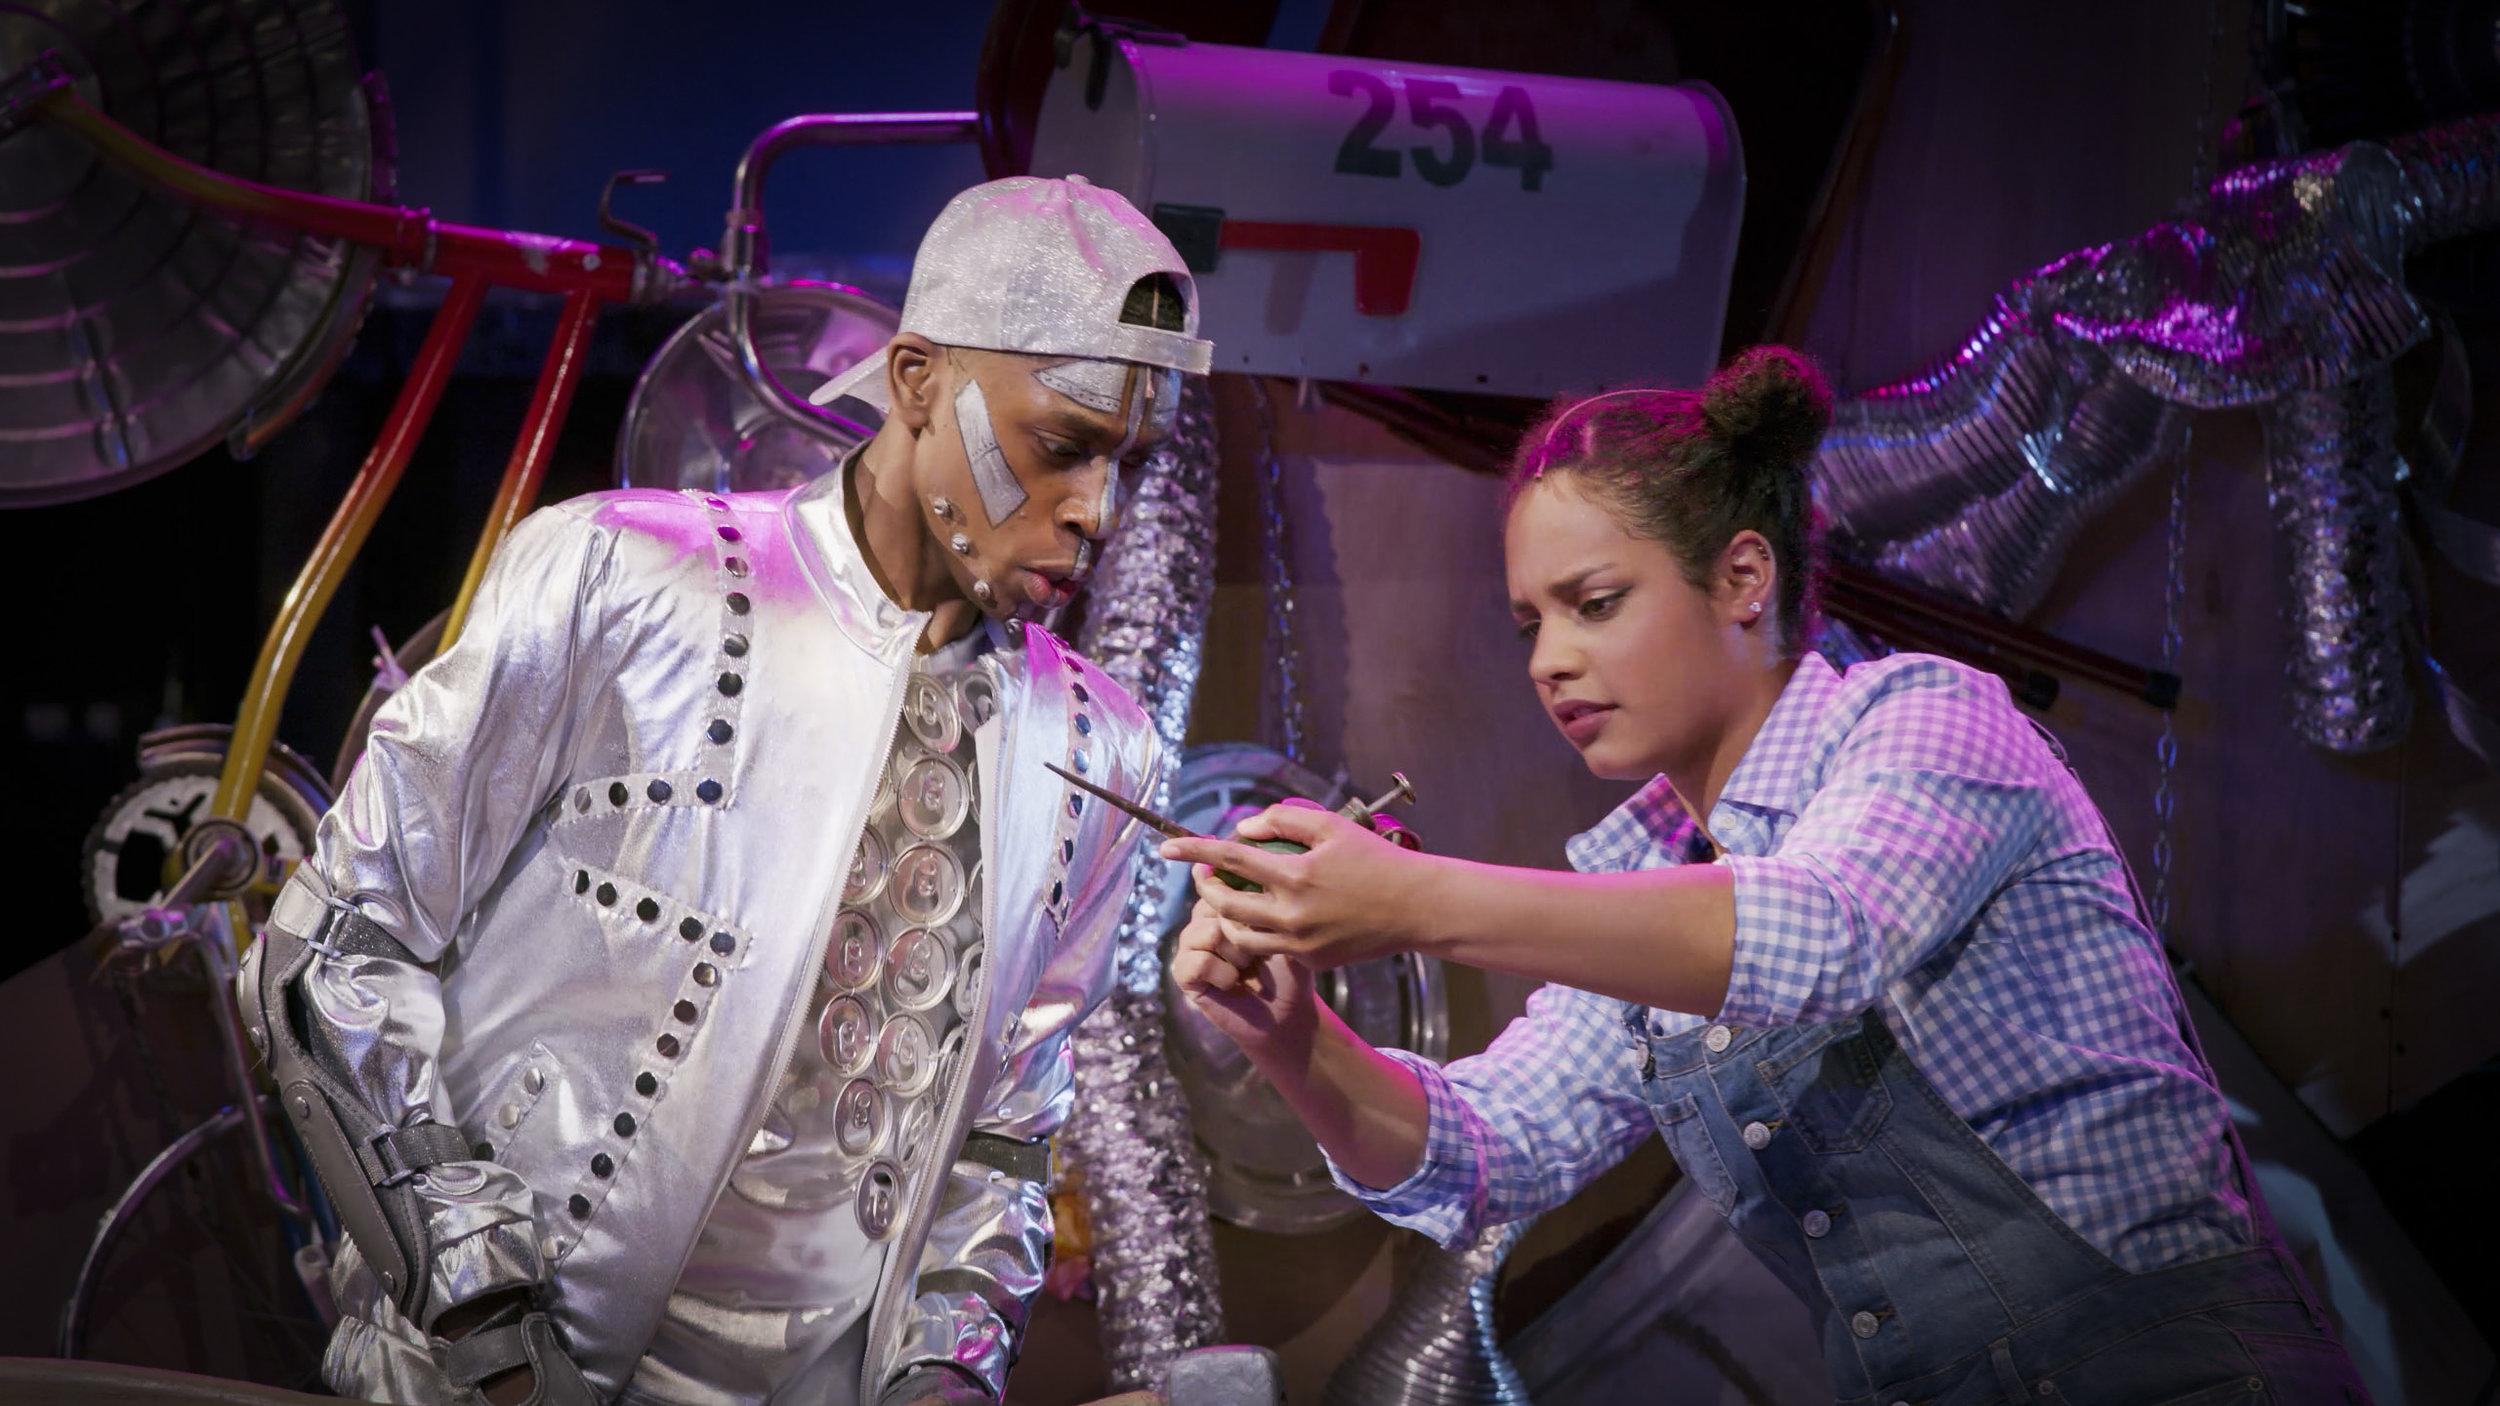 Jonathan Cooper as Tin Man and Alana Houston as Dorothy. (photo | Samuel Flint)